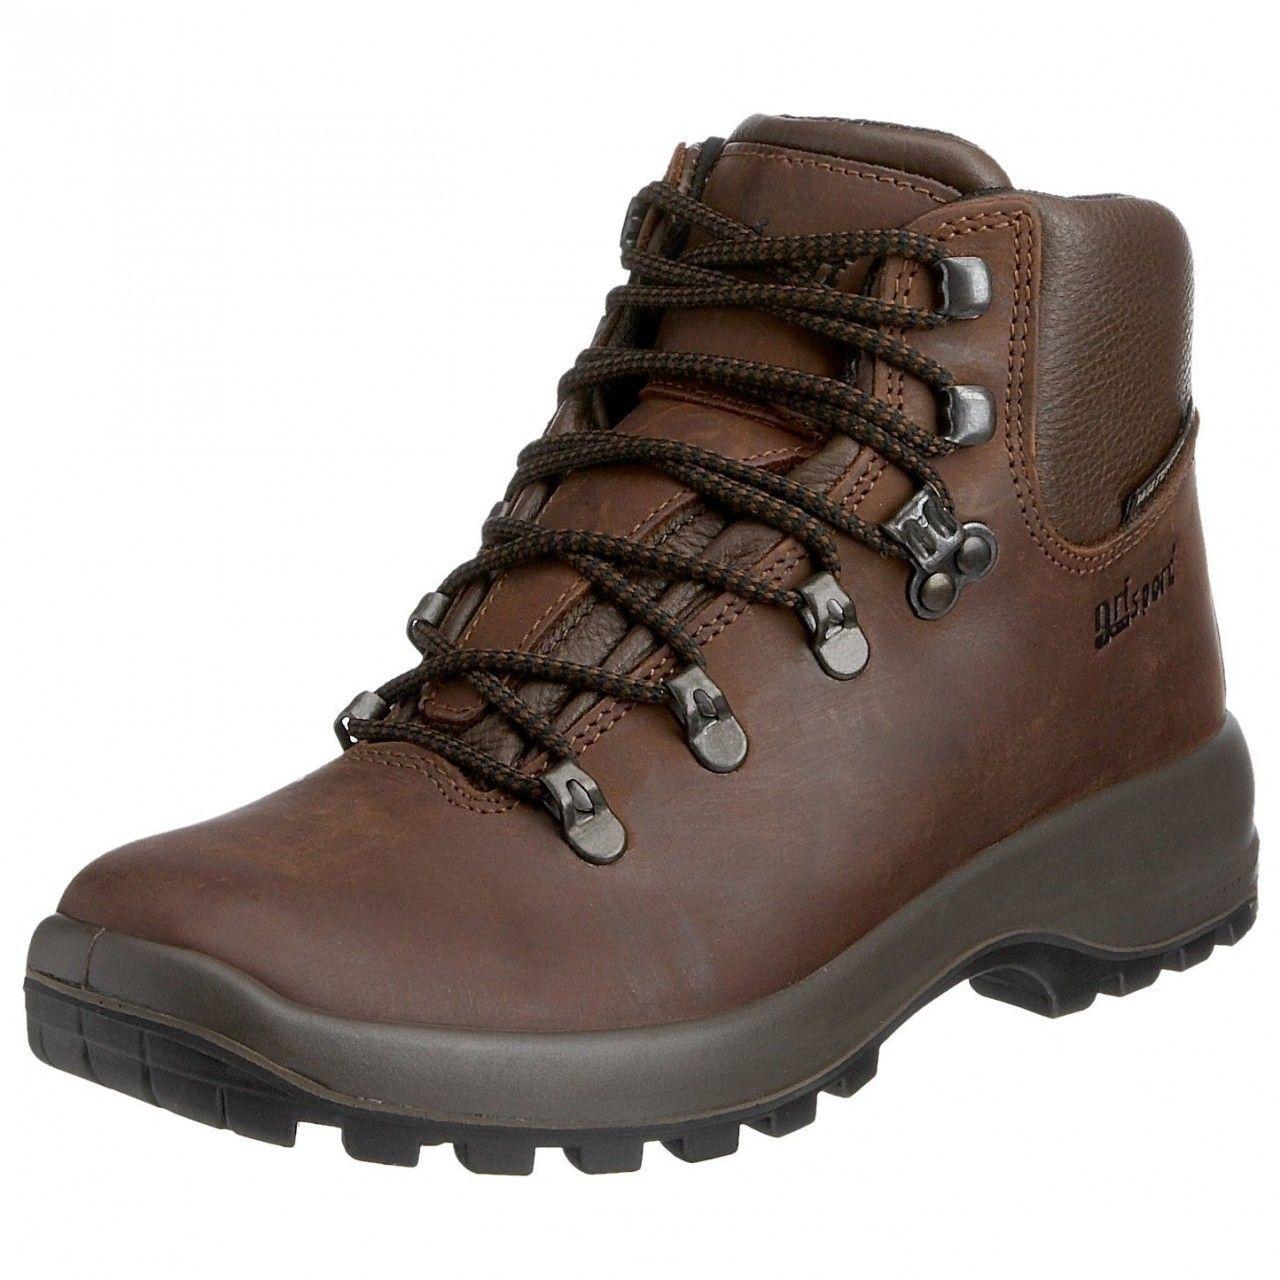 eb717f0699b Grisport Hurricane Boot - Brown | Grisport Walking Boots & Shoes ...